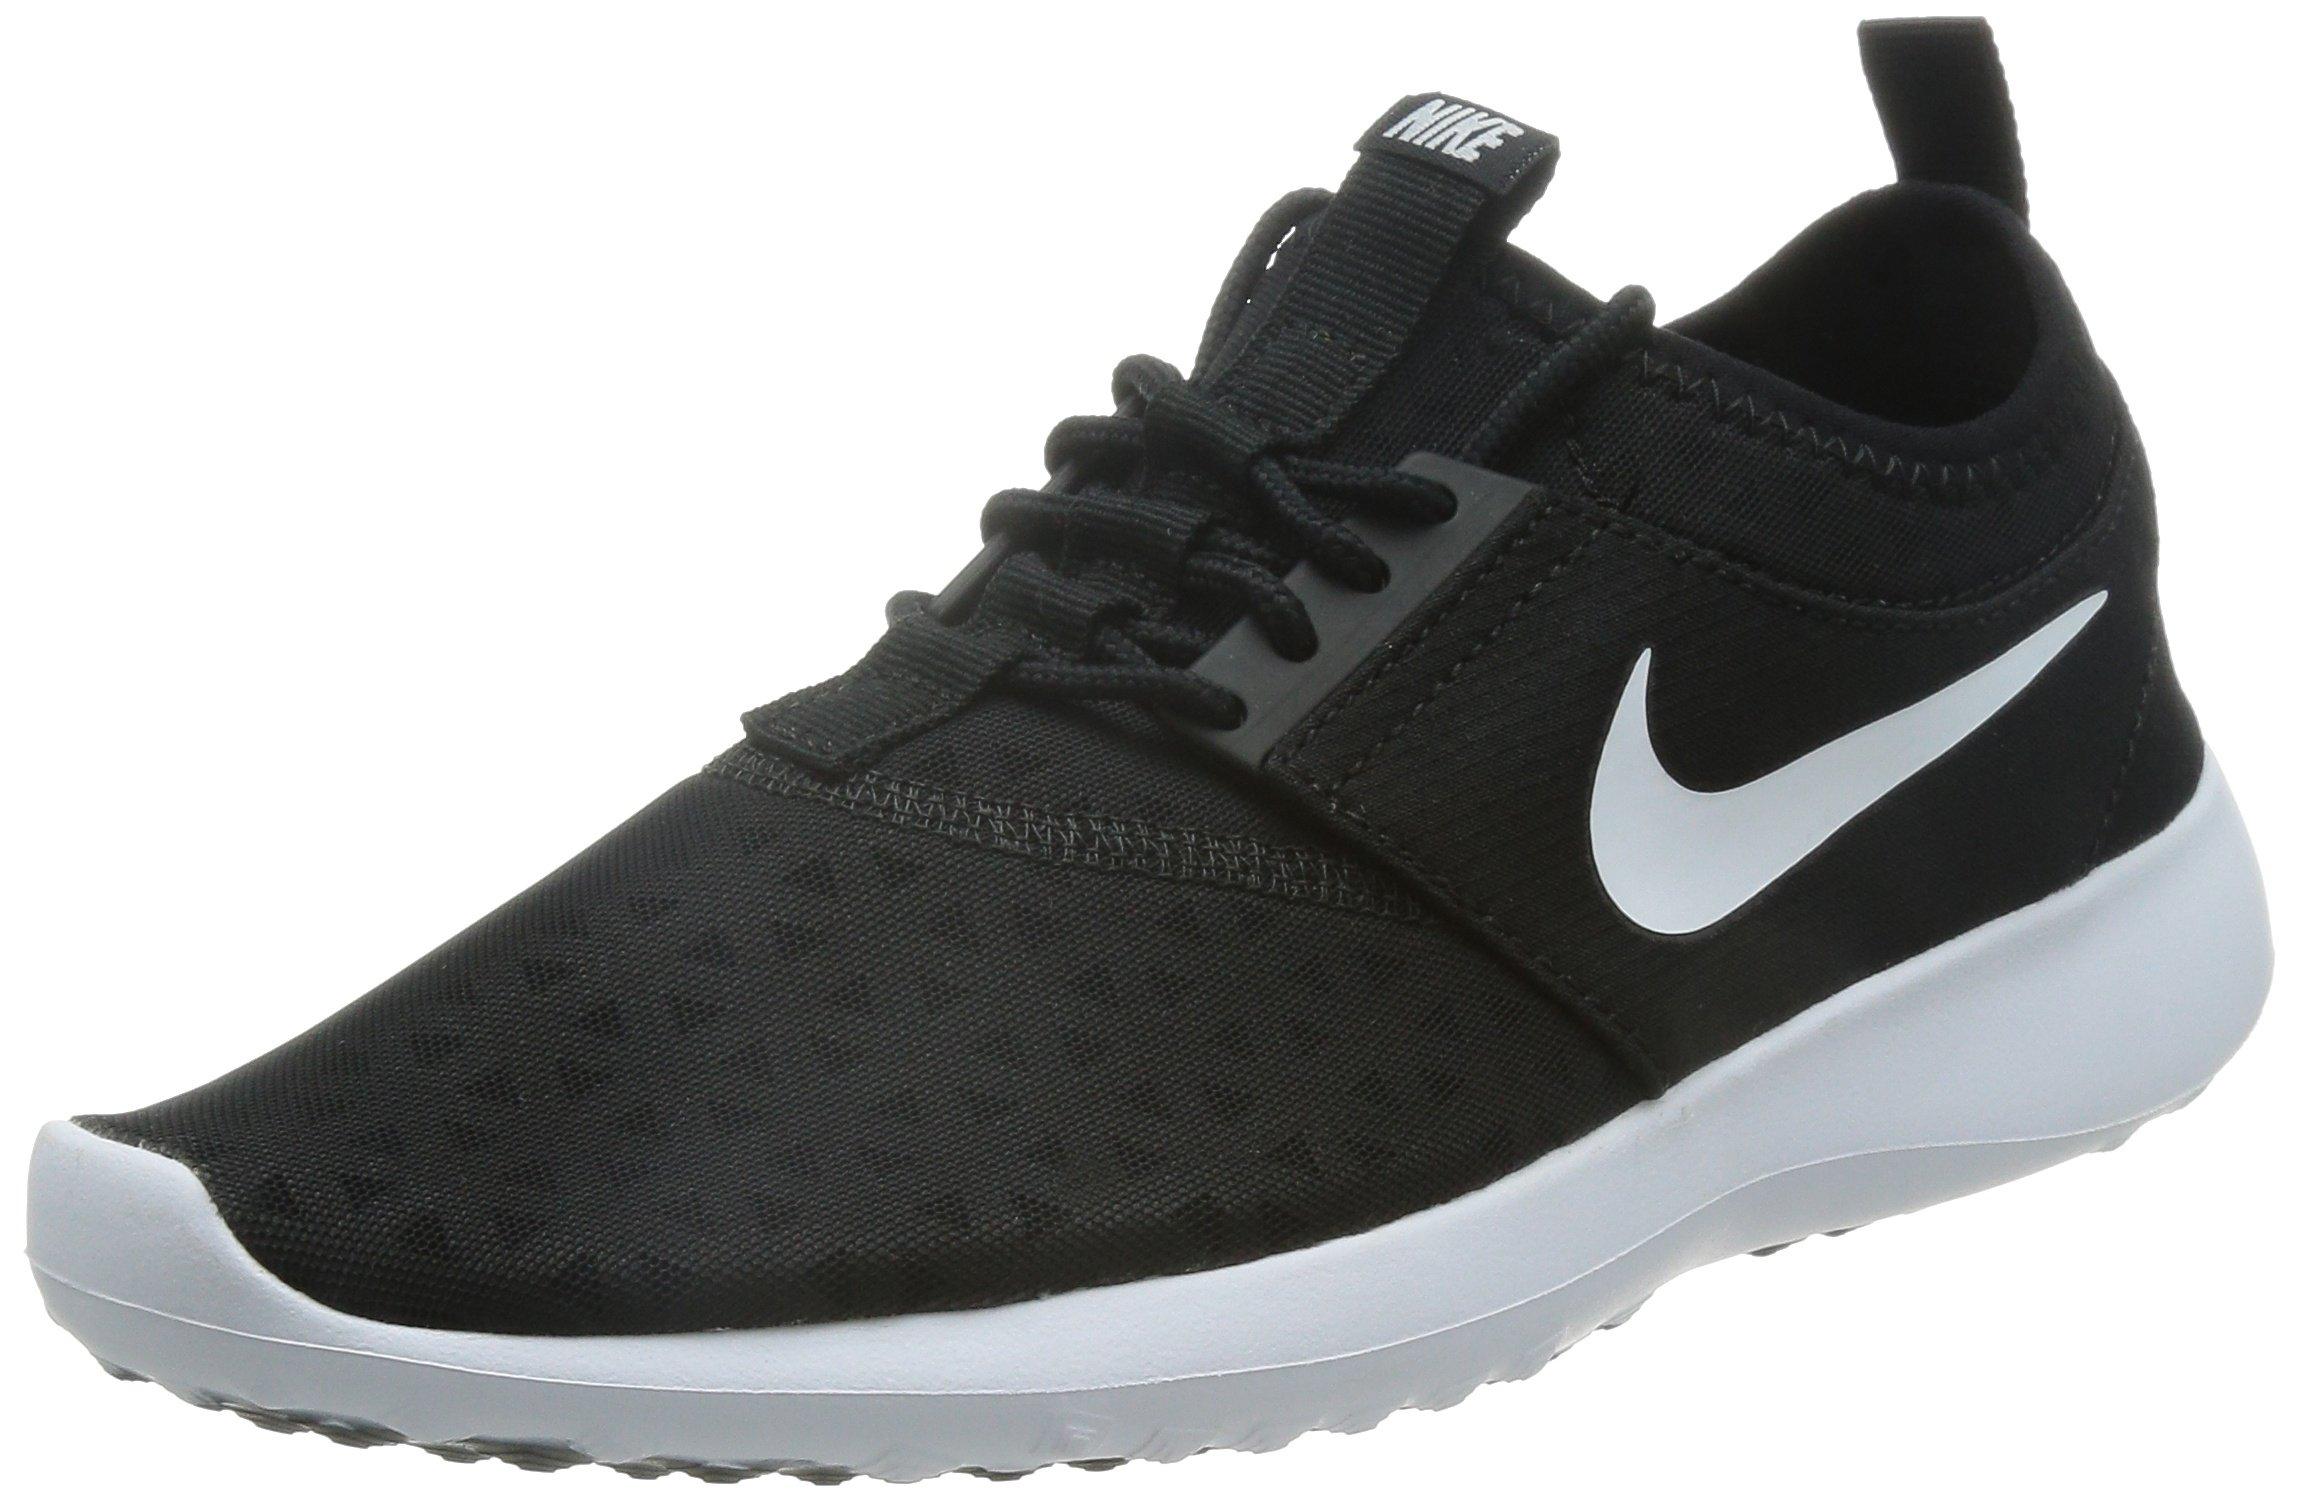 buy online 1baaf f0ba3 Galleon - Nike Women s Juvenate Sneaker Black White 6.5 B US